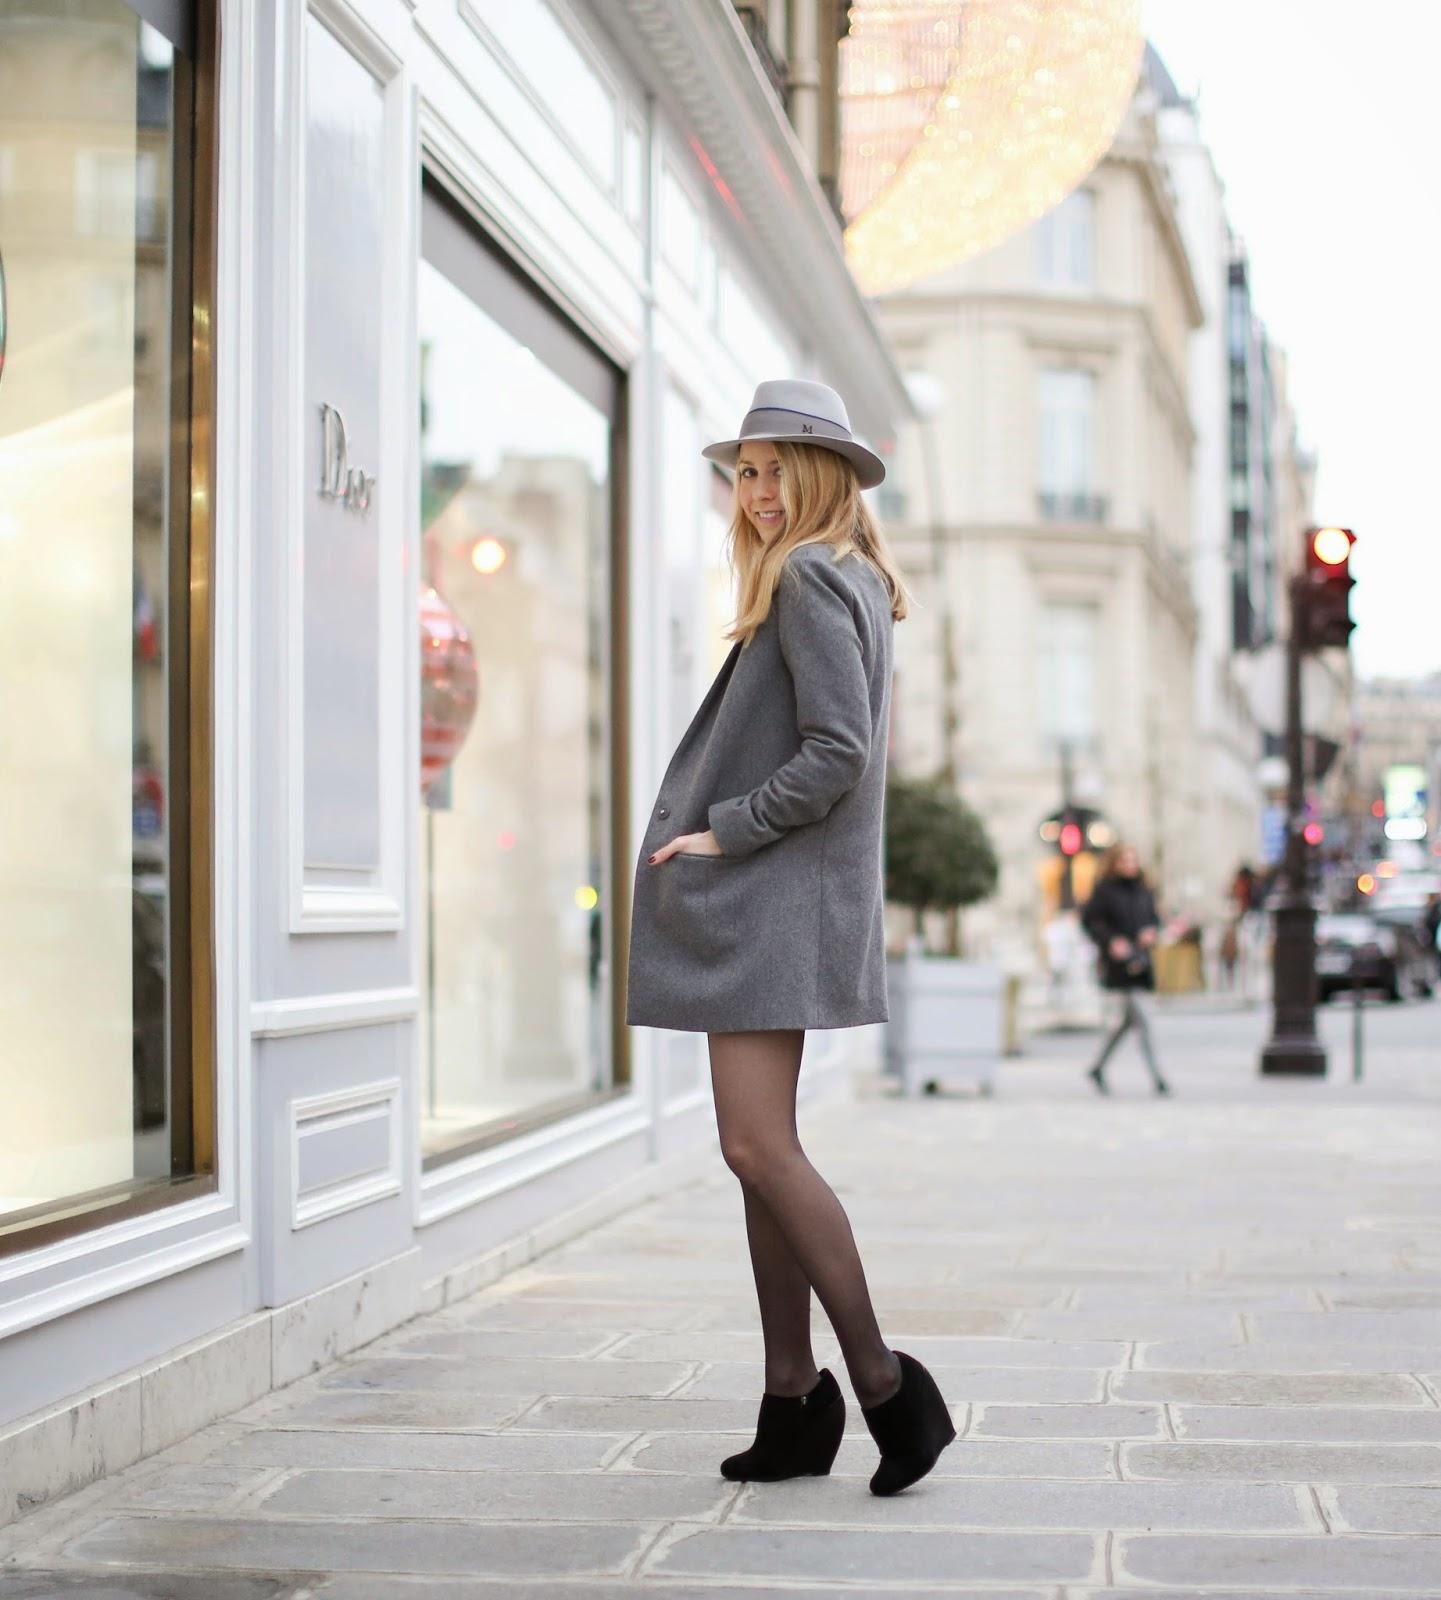 cos, topshop, alaia, chanel, maison michel, avenue montaigne, fashion blogger, dior, streetstyle, christmas eve